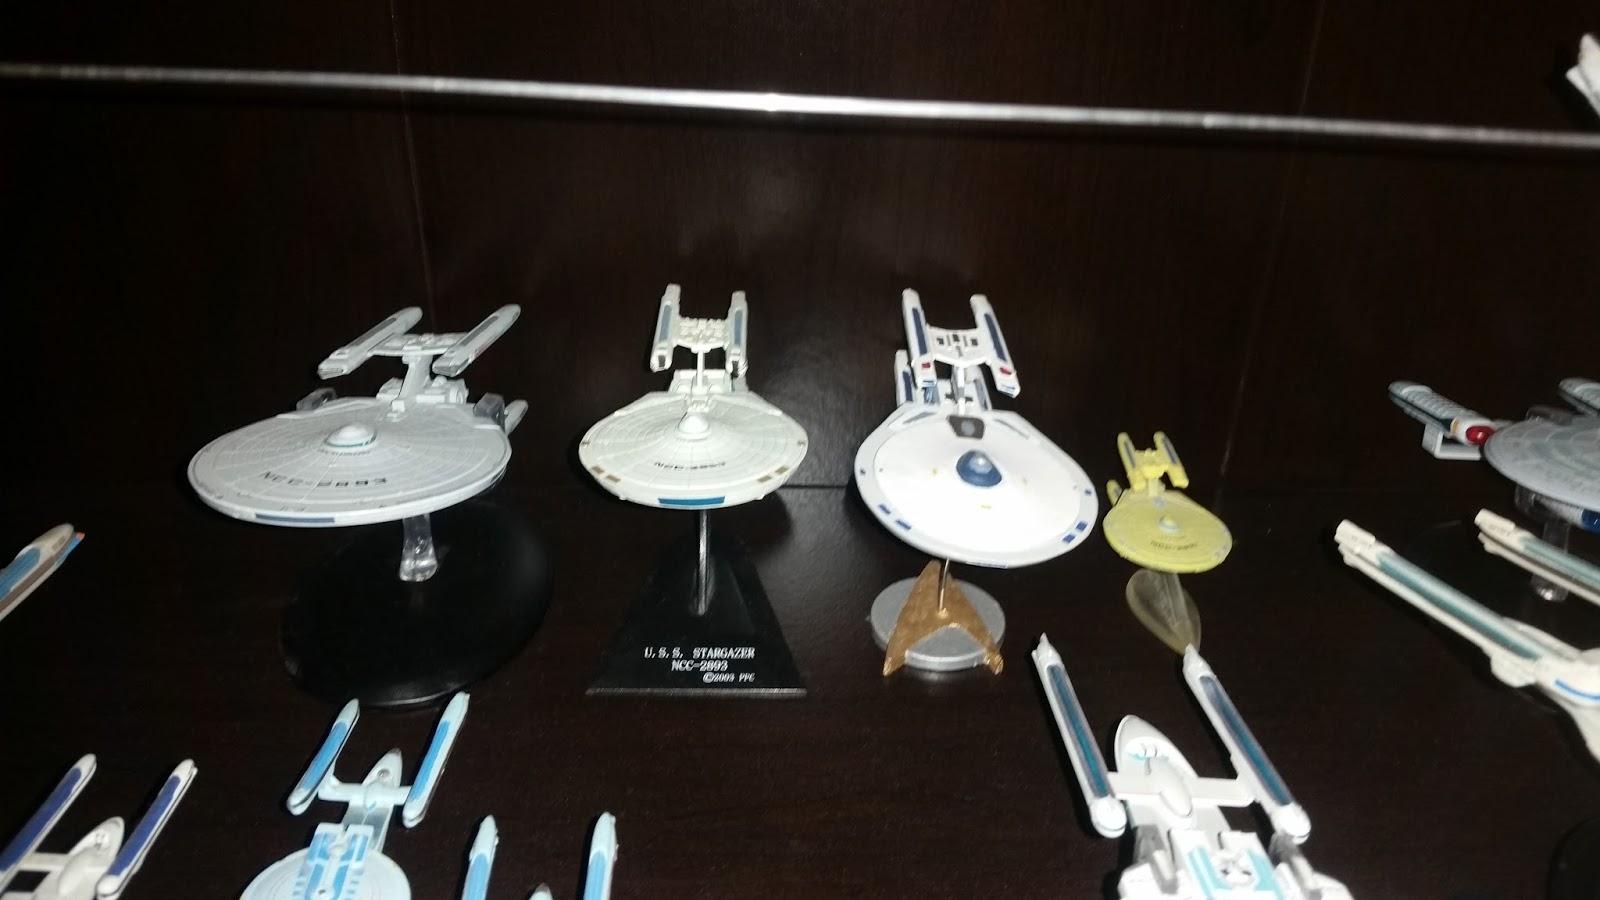 Uss Stargazer Size Comparison